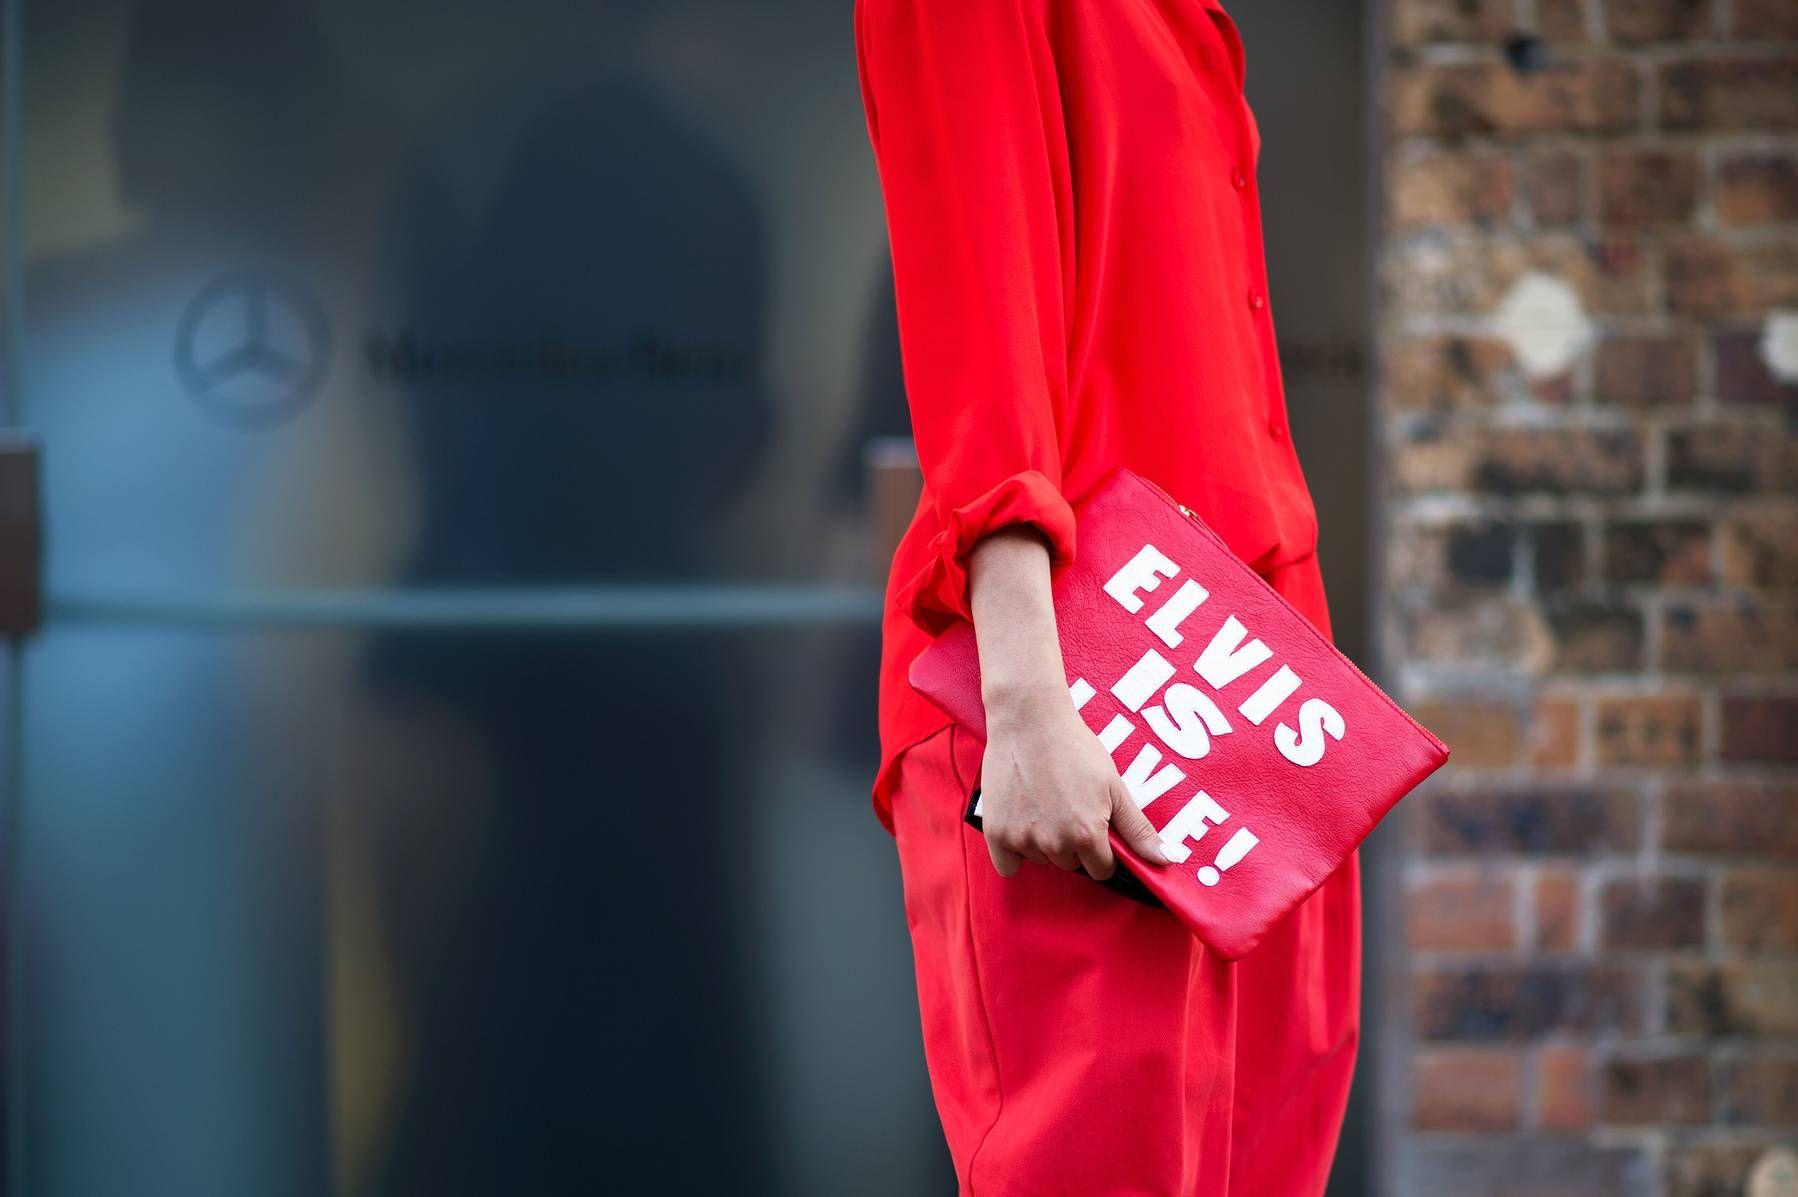 Street Style: Bright Hues at Sydney Fashion Week - The Cut